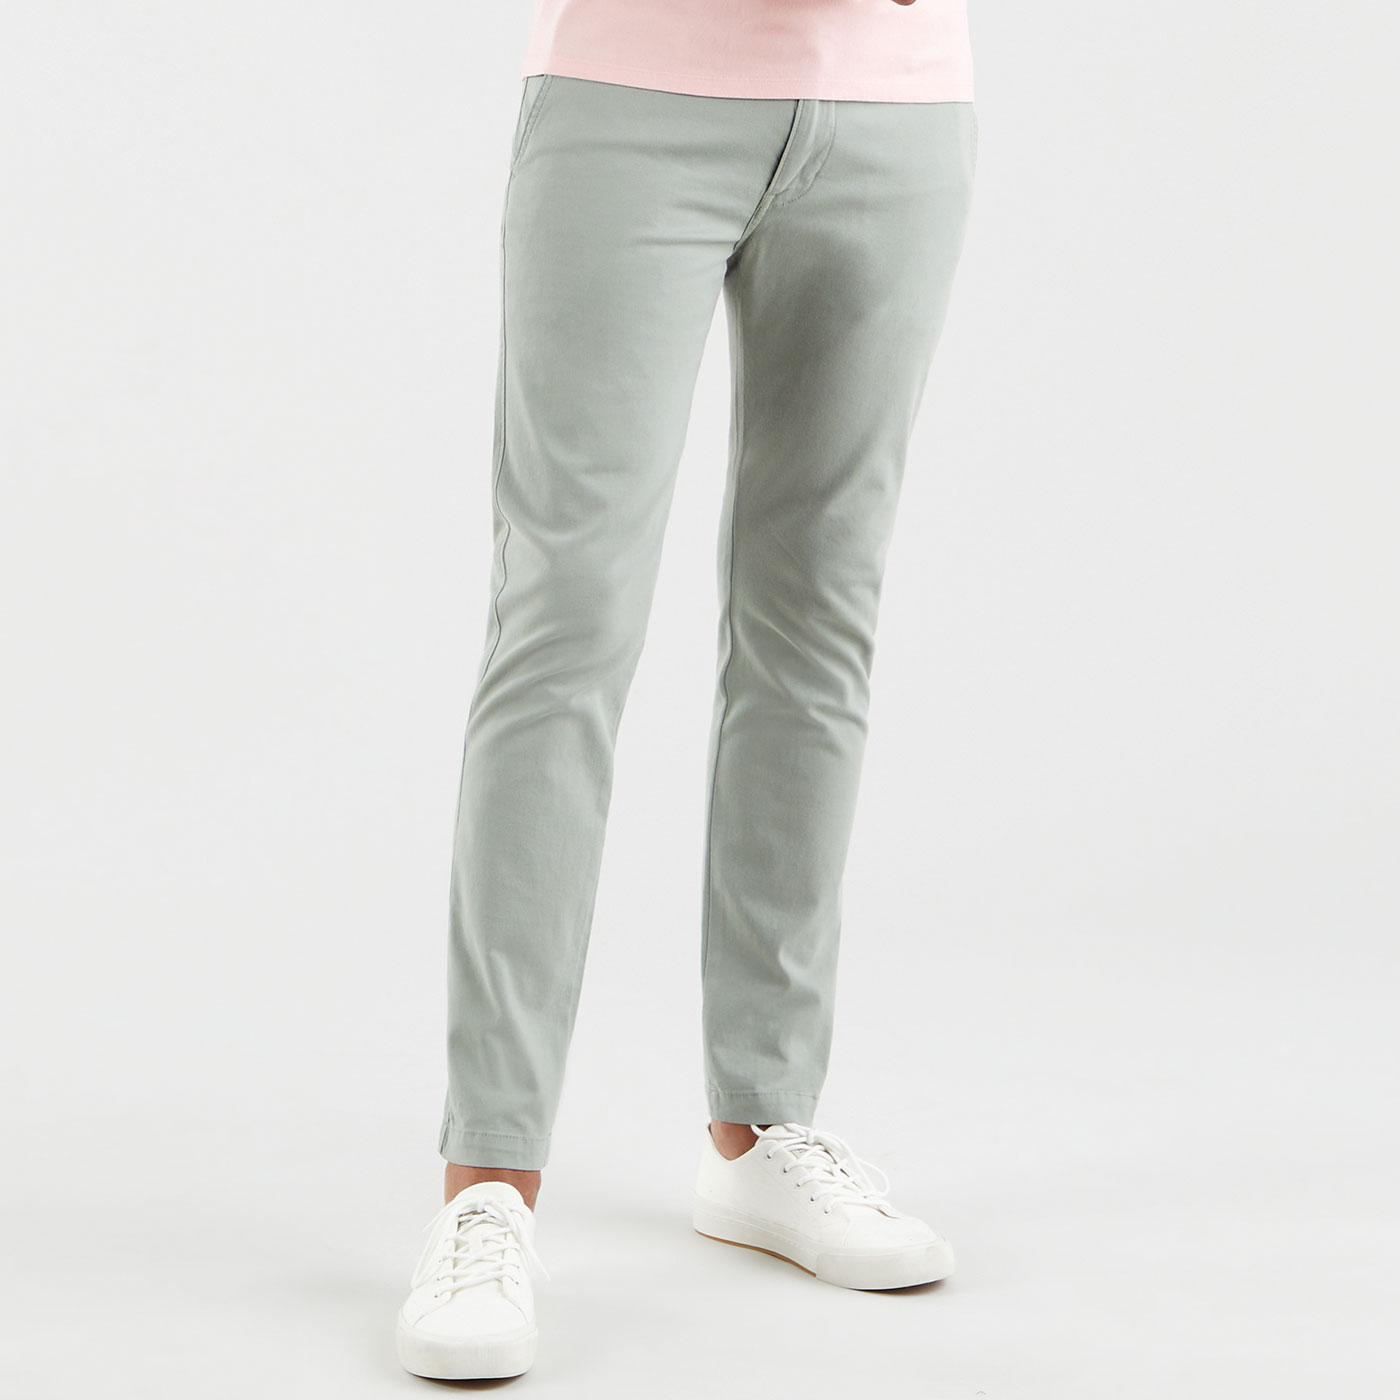 LEVI'S Standard Taper XX Chino Trousers (Shadow)